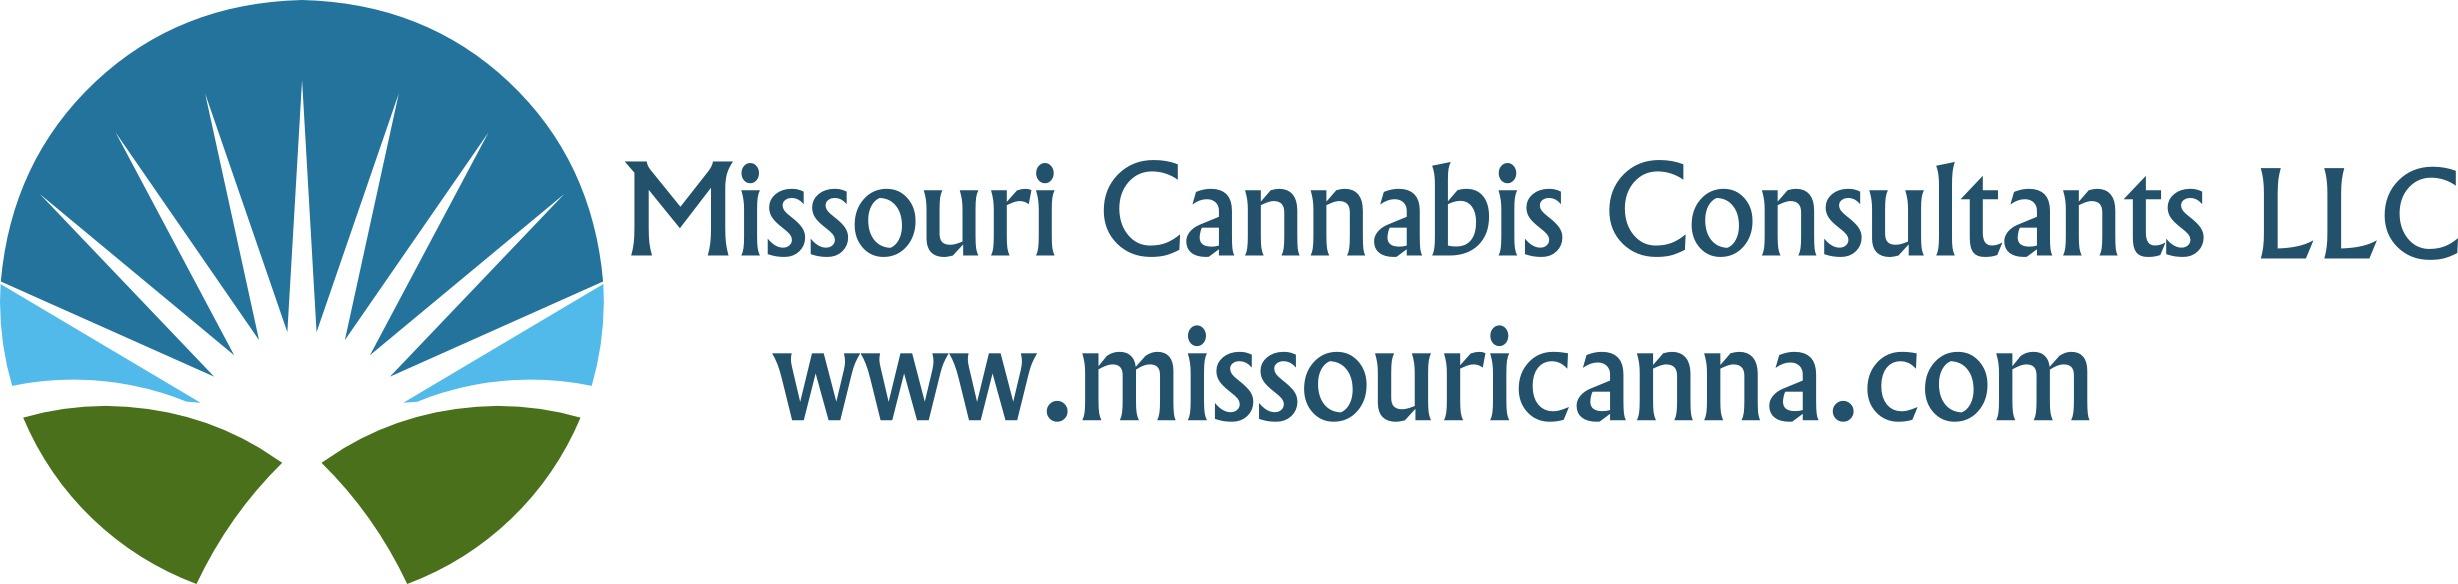 Missouri Cannabis Consulting Logo